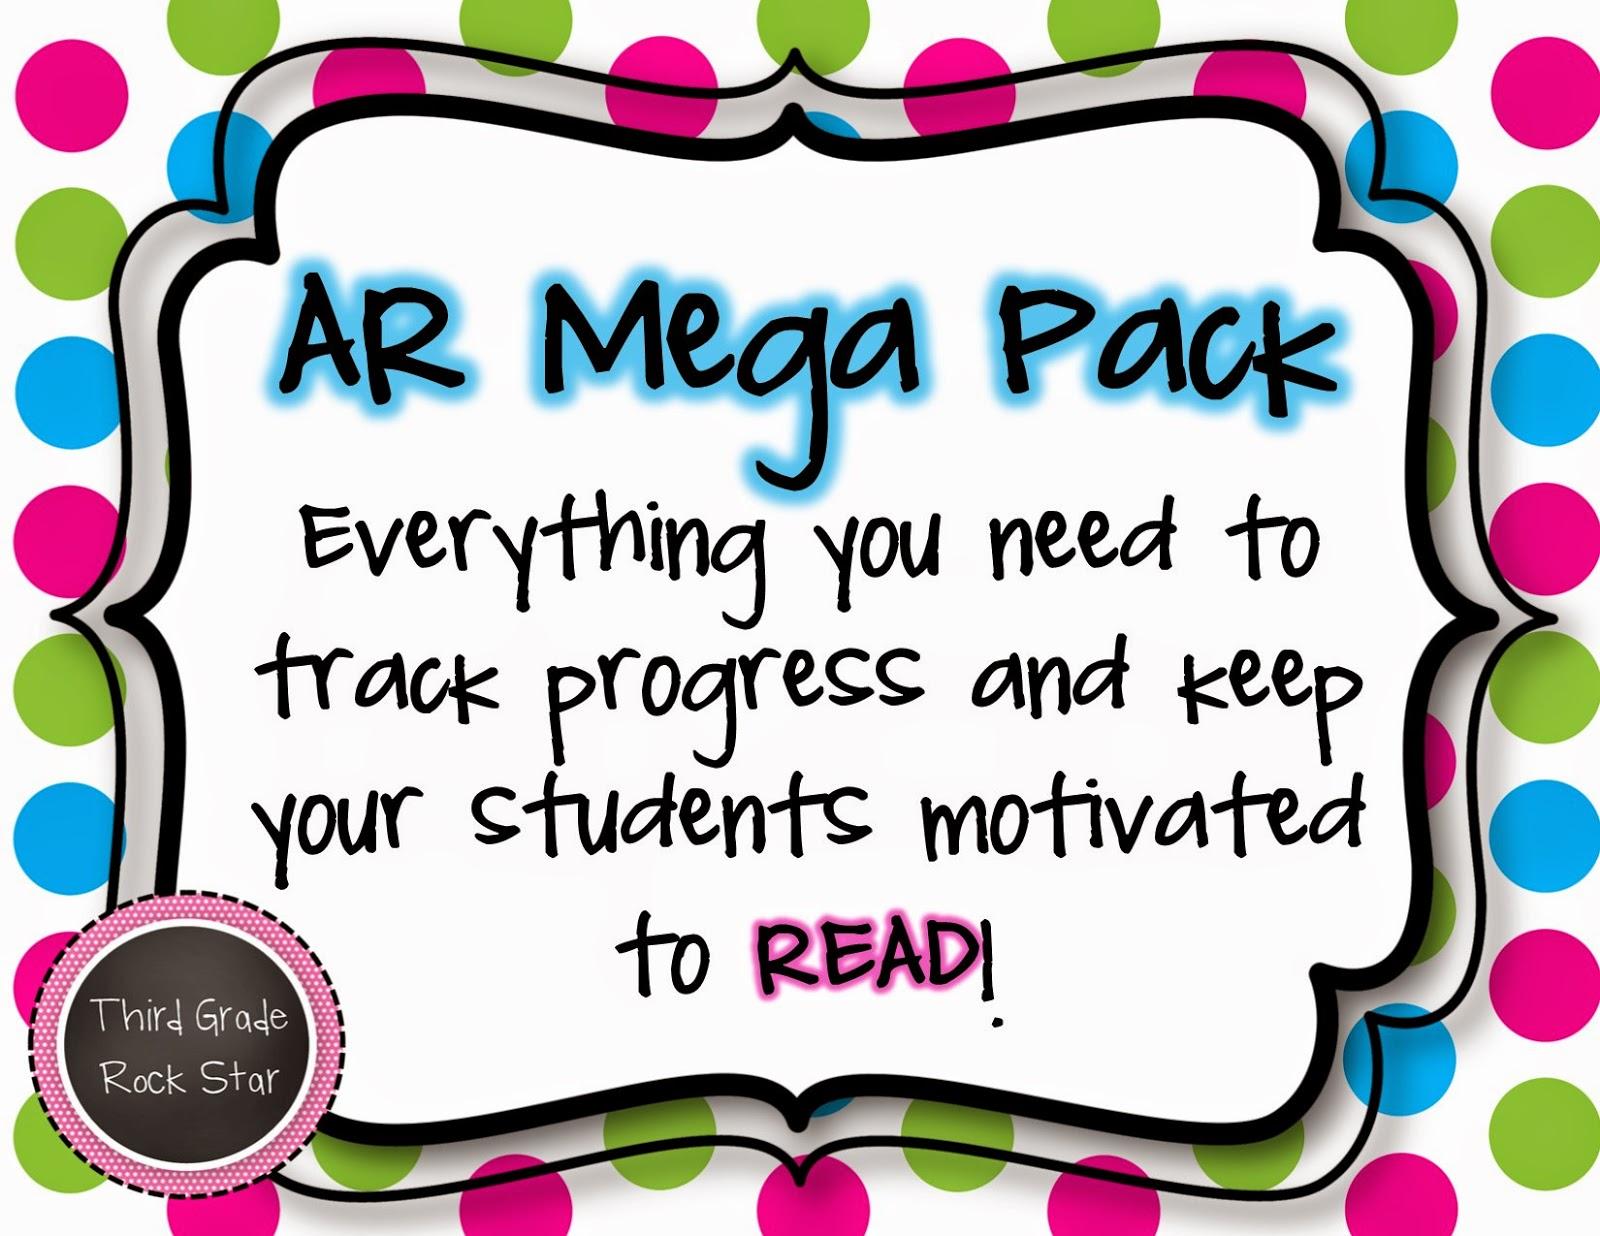 AR Mega Pack